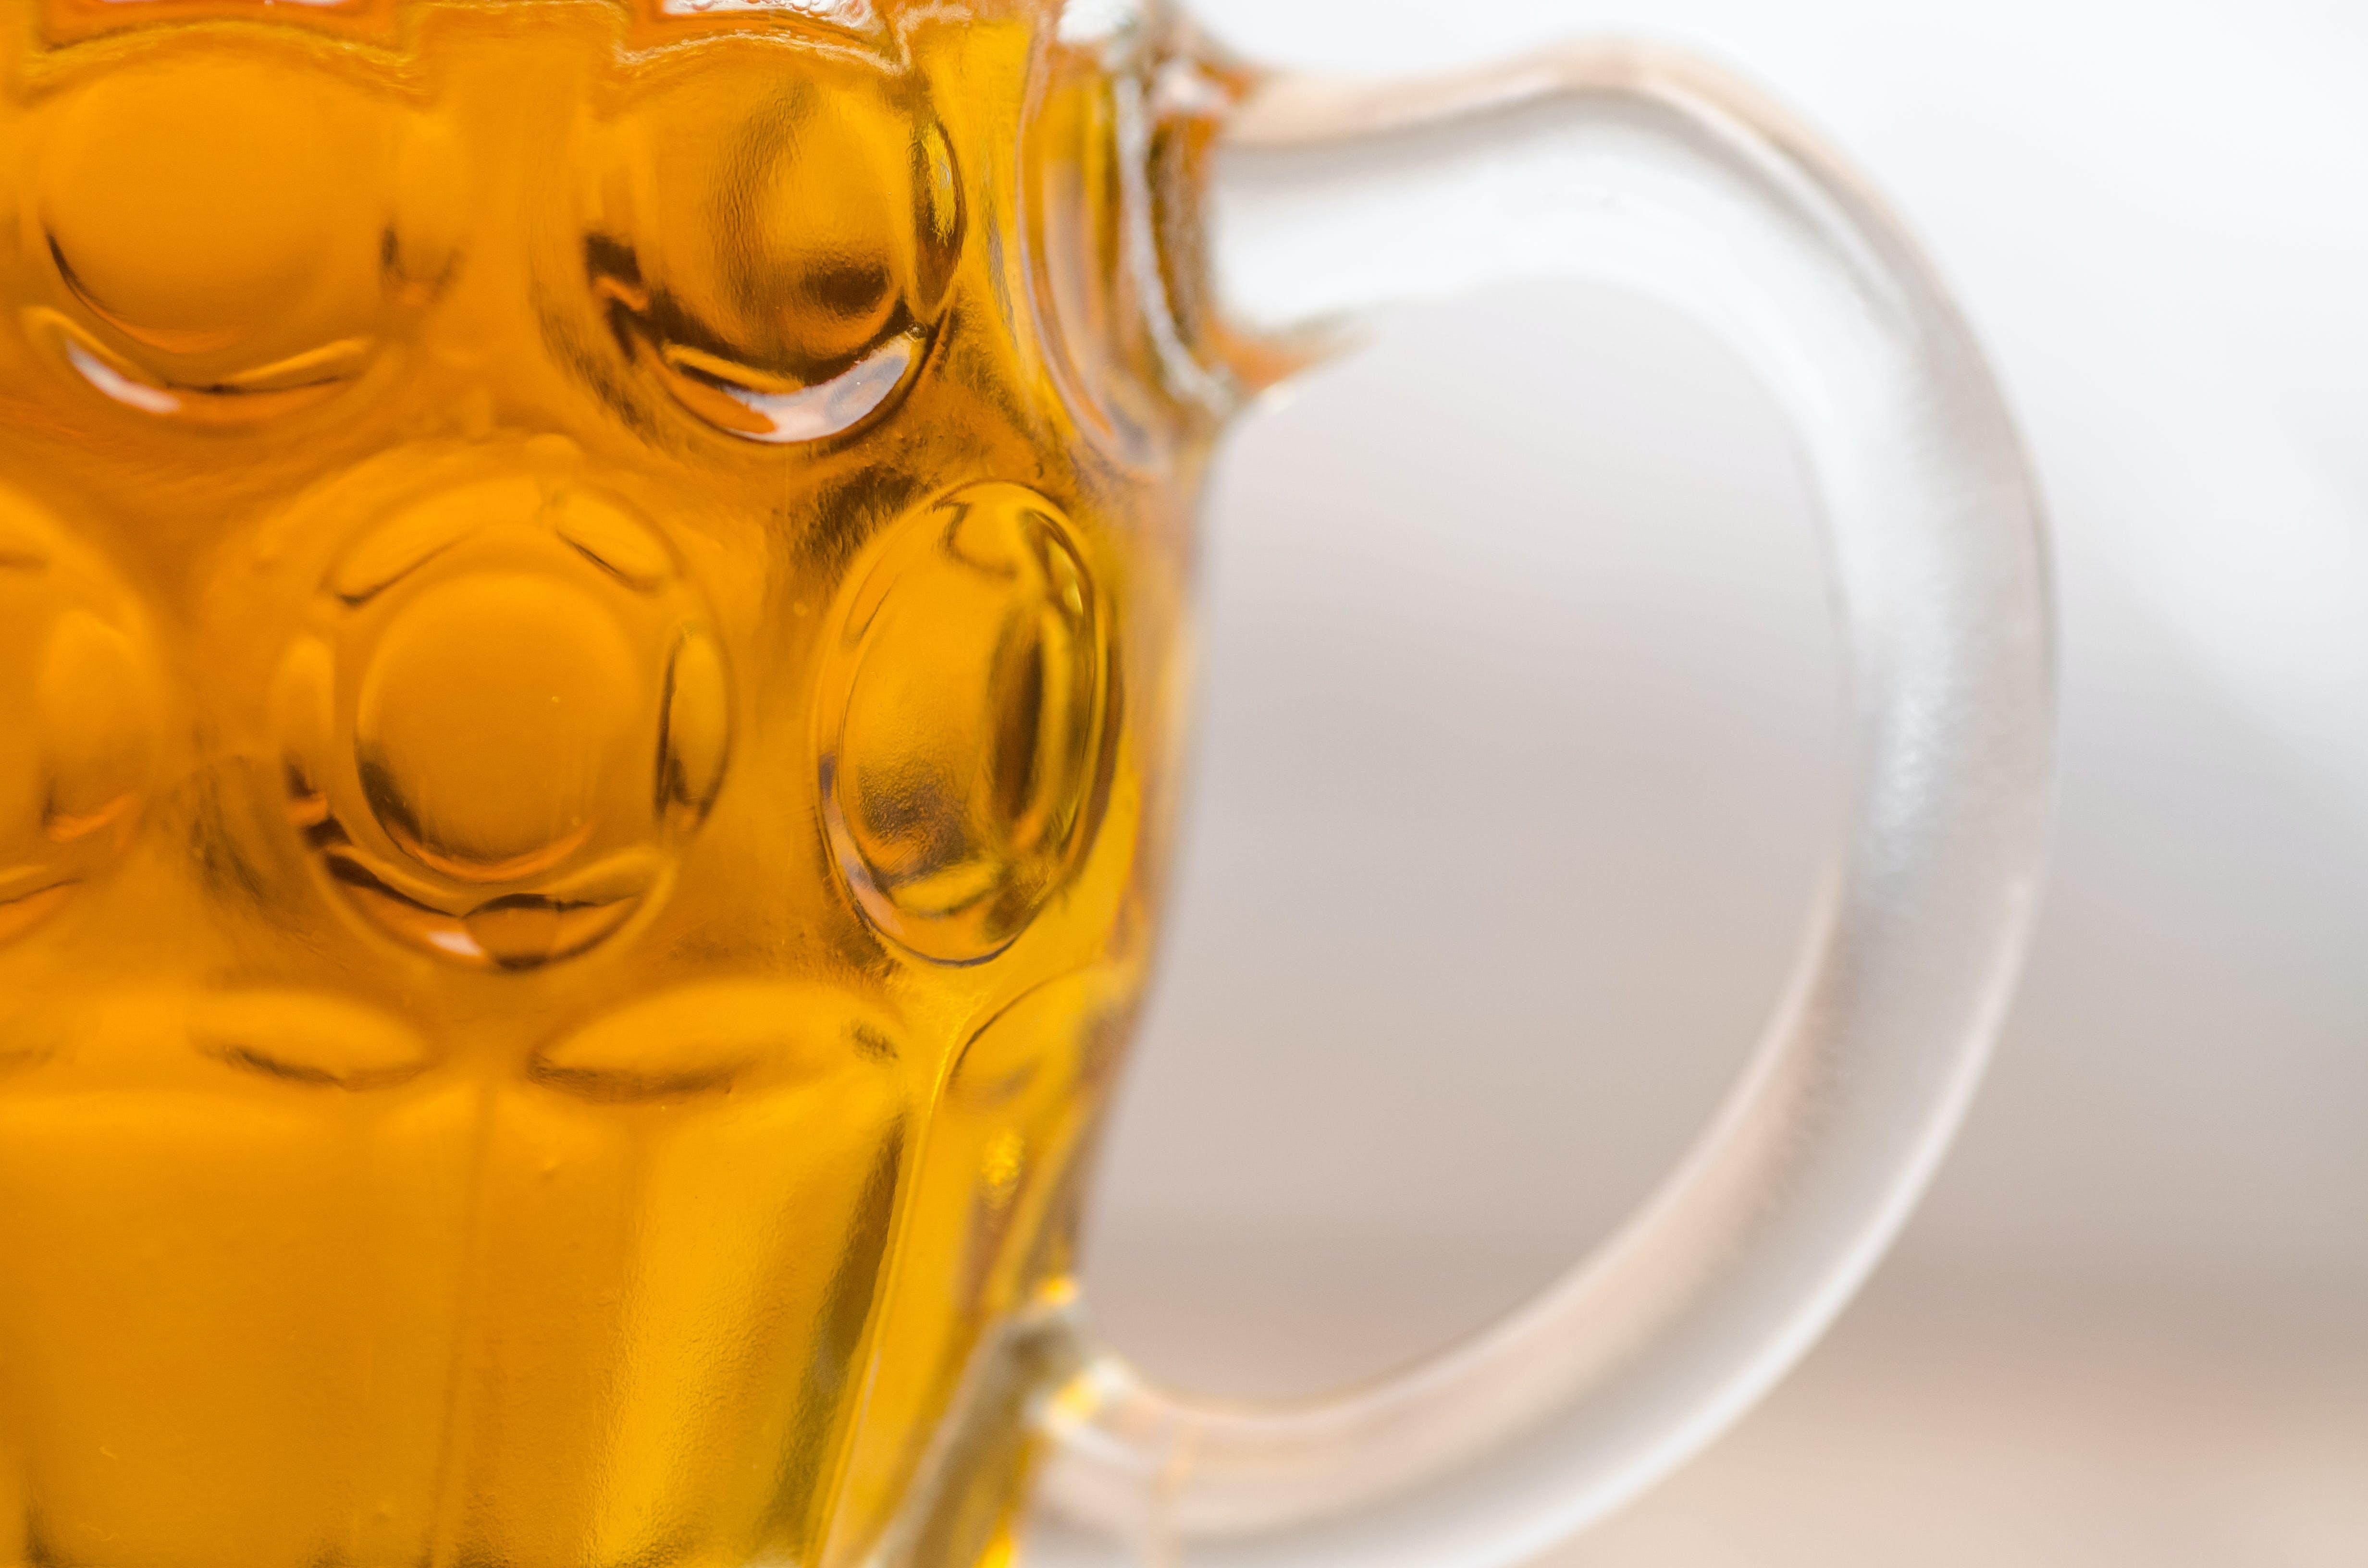 Closeup Photo of Clear Glass Mug